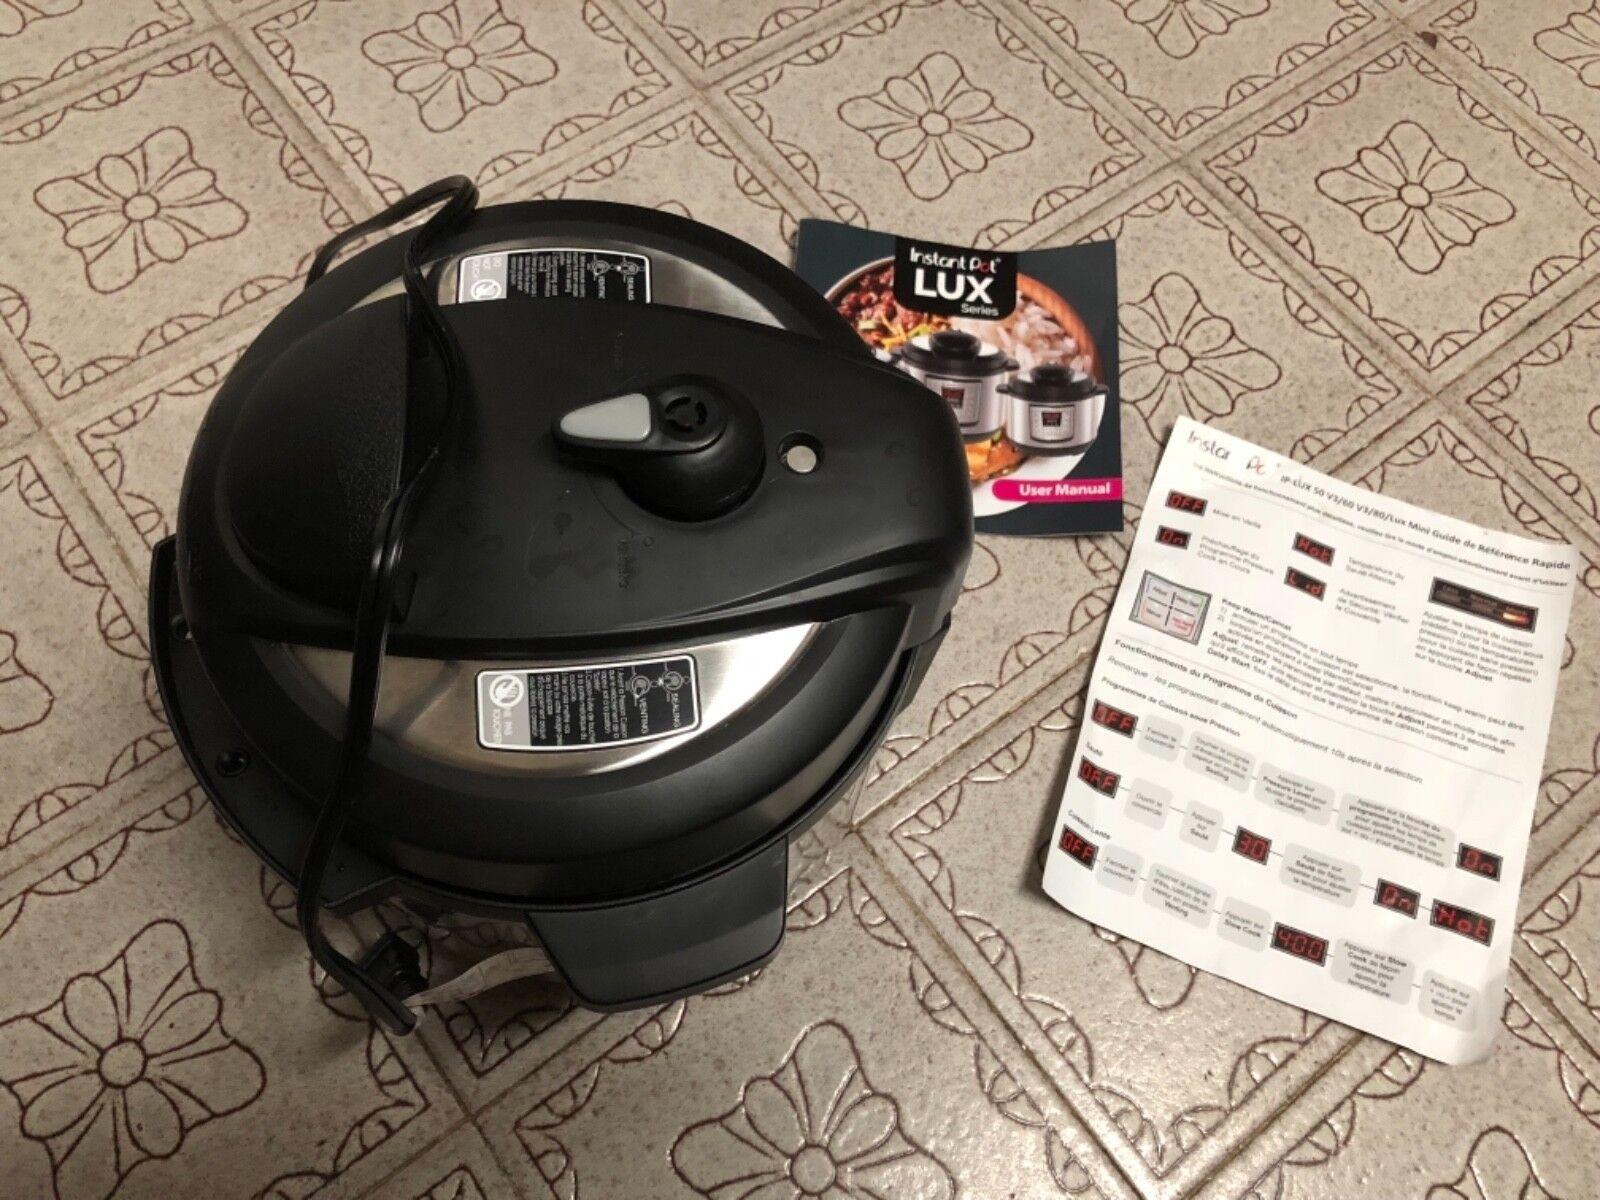 Instant Pot LUX50 V3 6-in-1 6 Quart Programmable Pressure Cooker